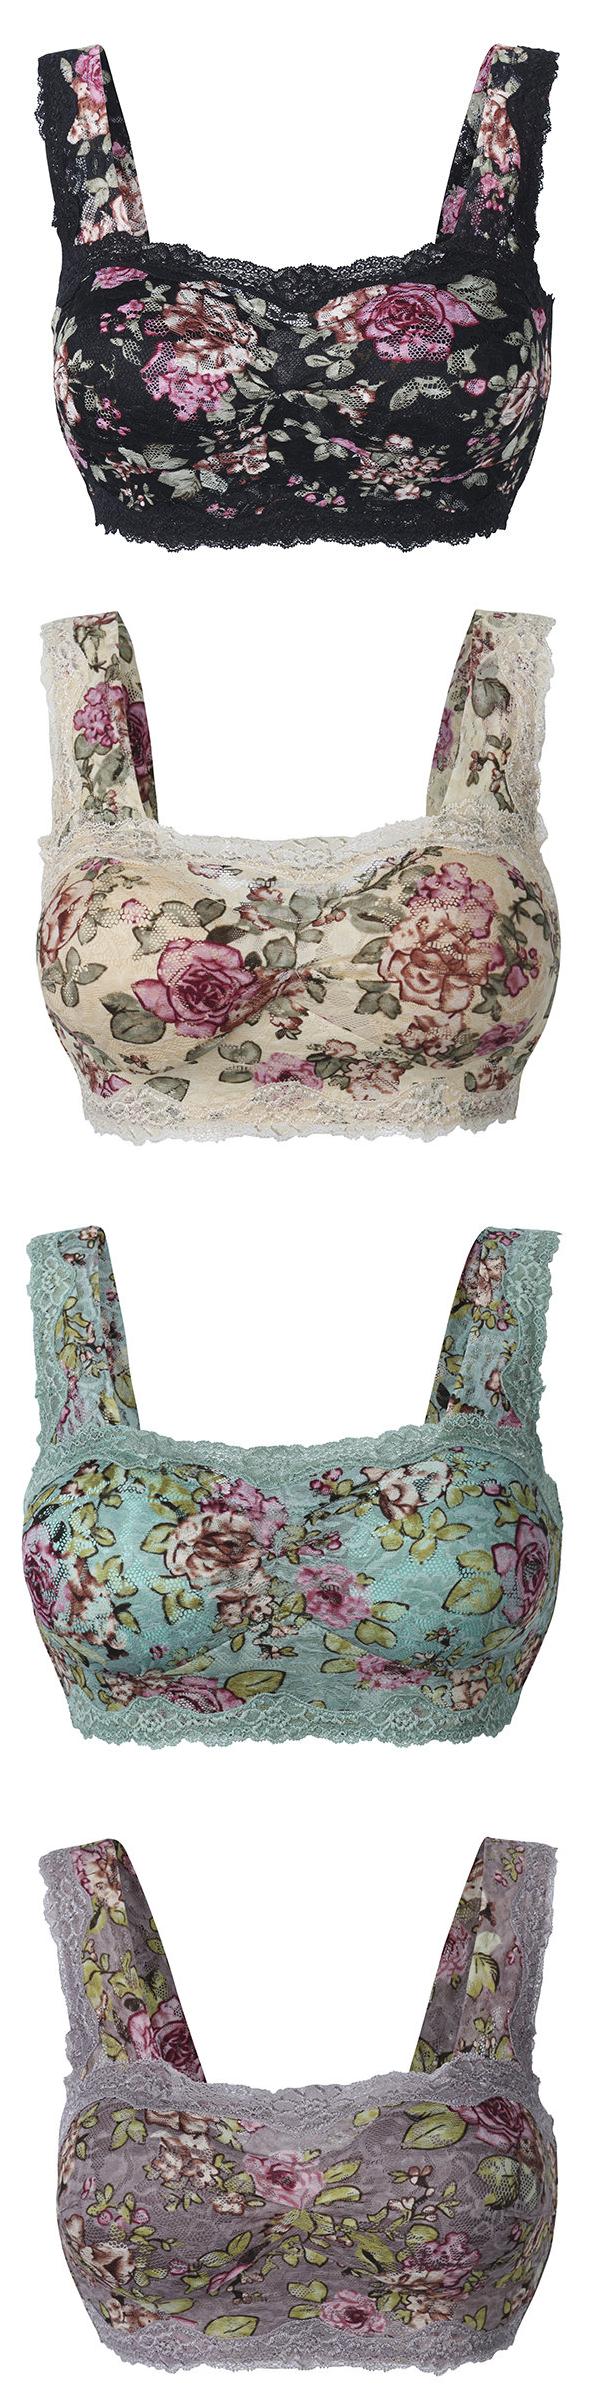 46bdc7fa41 Plus Size Floral Lace Hem Bras Breathable Wireless Vest Bra